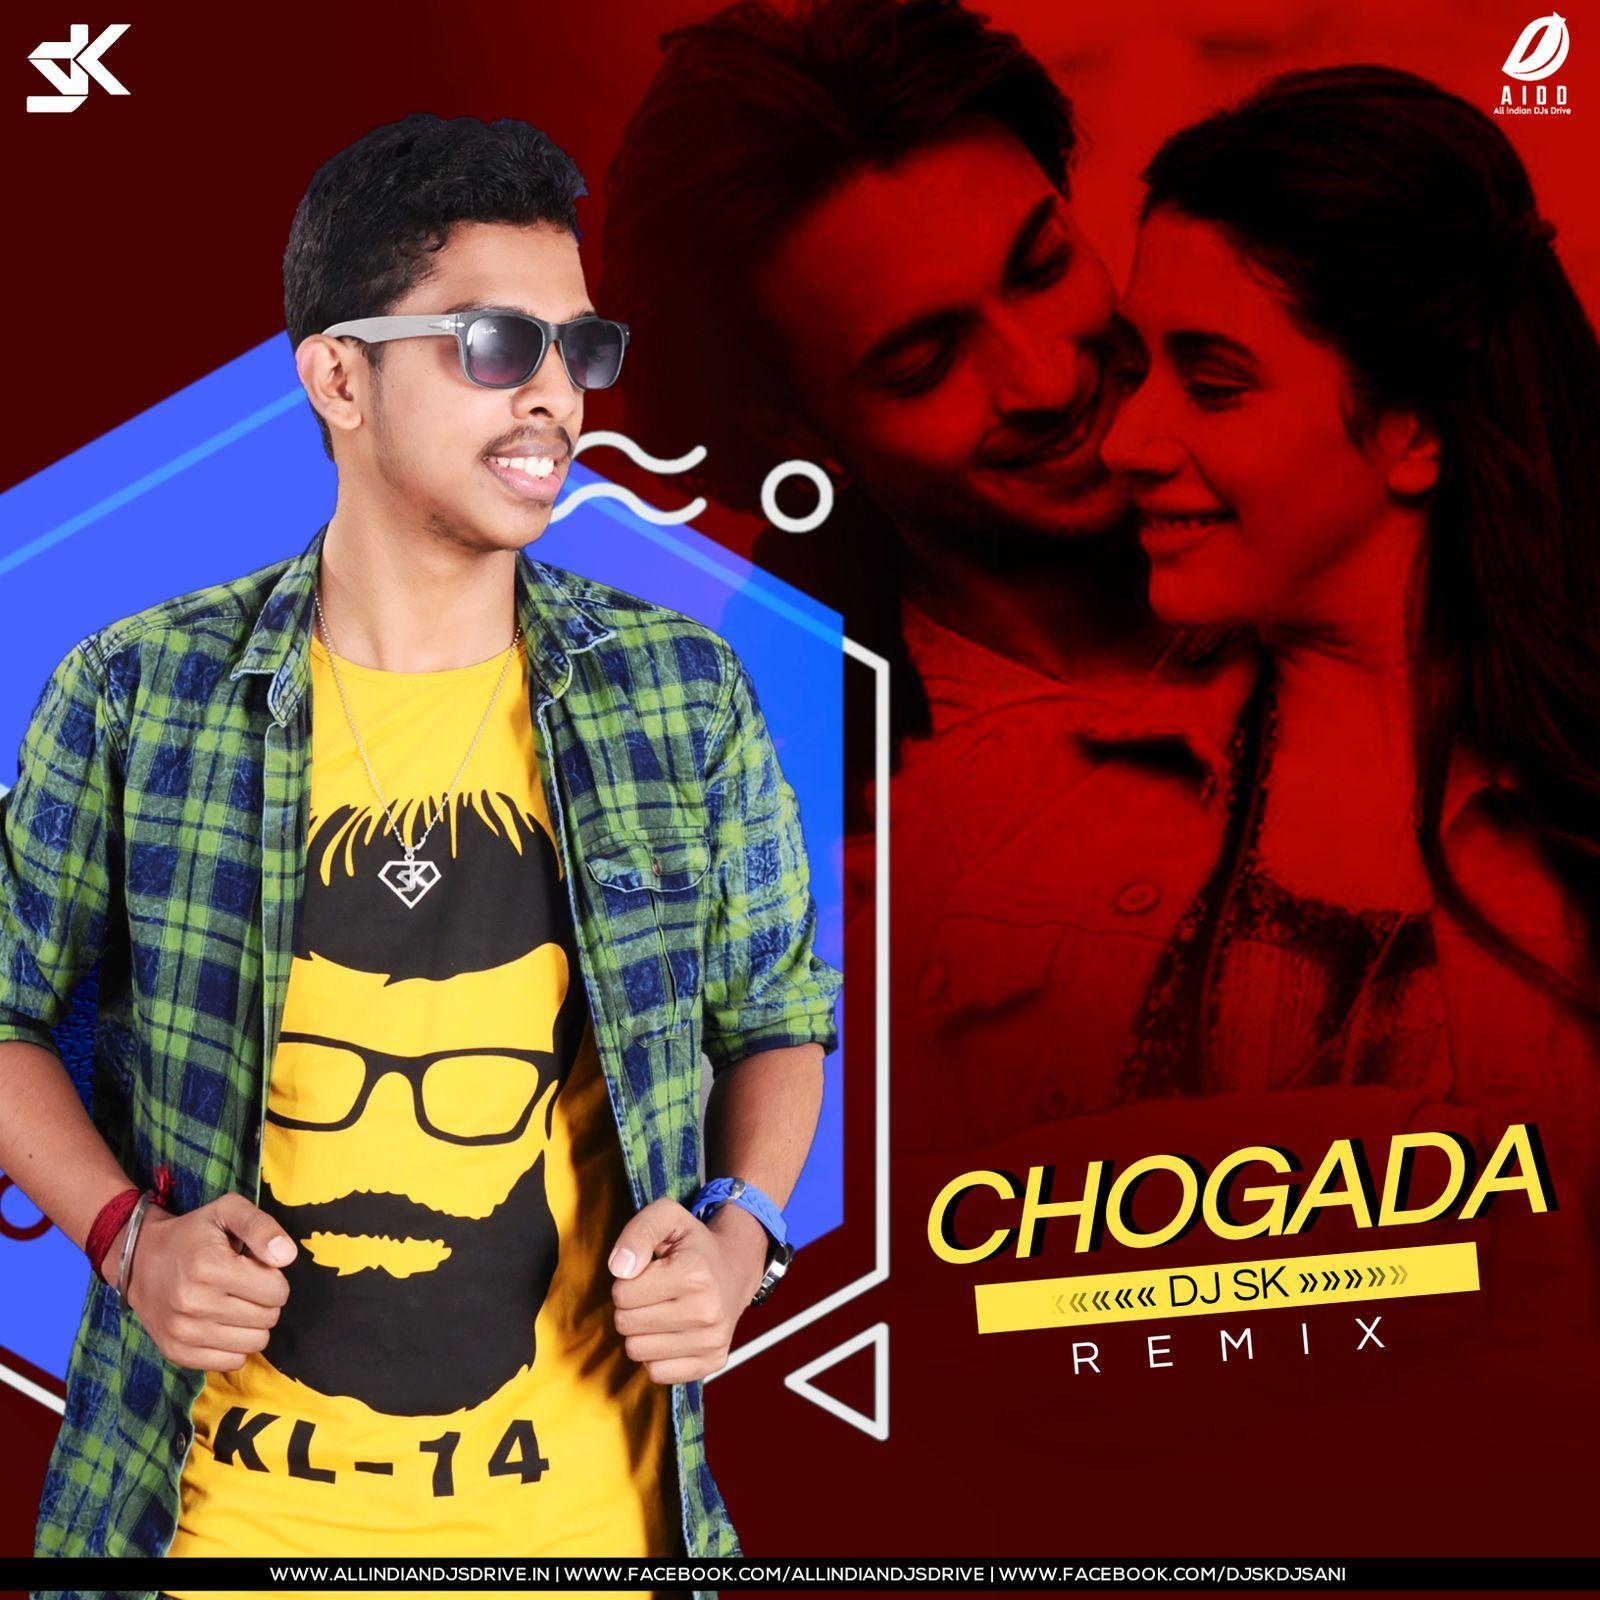 Chogada (Remix) - DJ SK by DJ SK from DJ SK: Listen for free